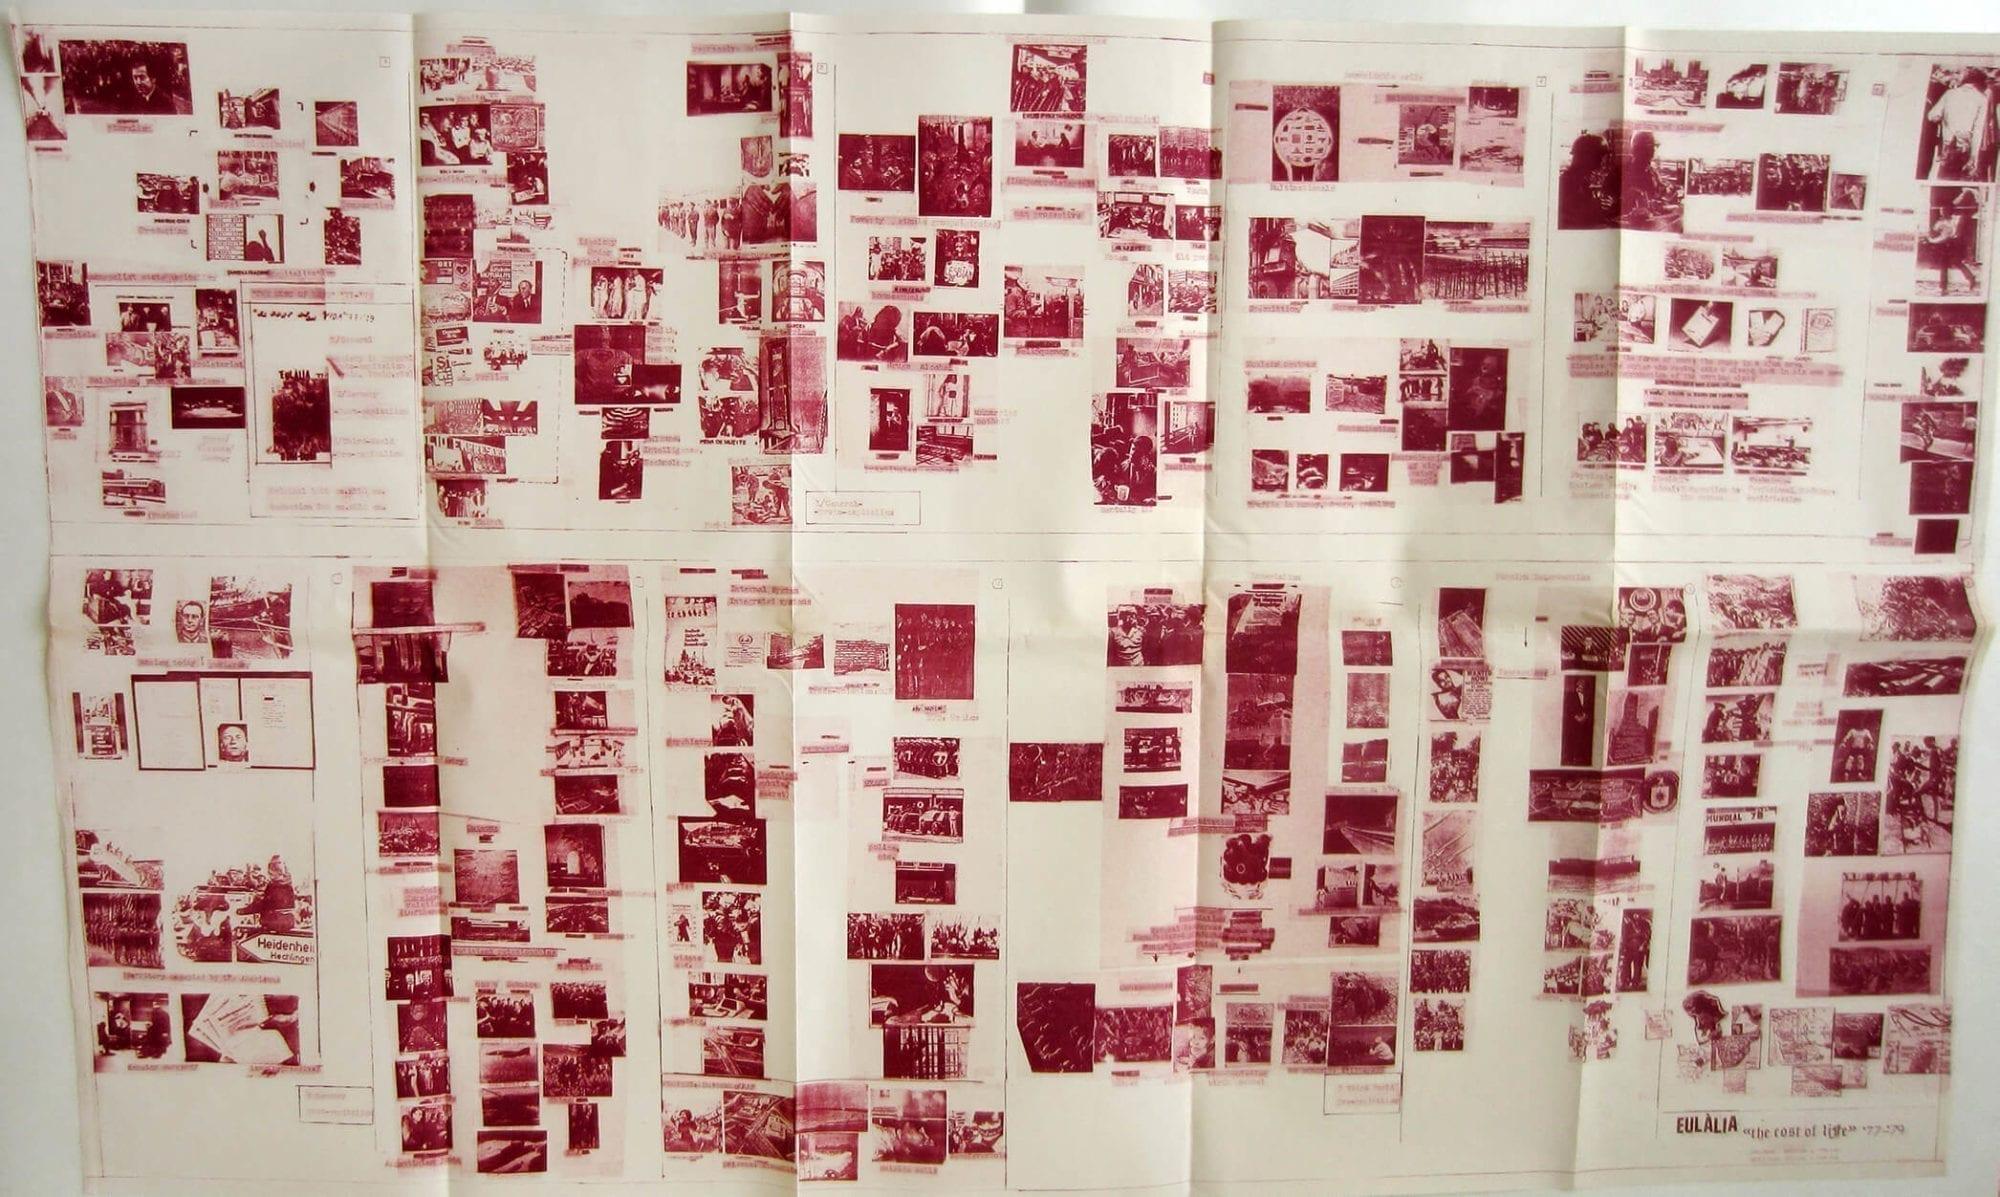 Eulia Grau, The cost of life, 1977-79